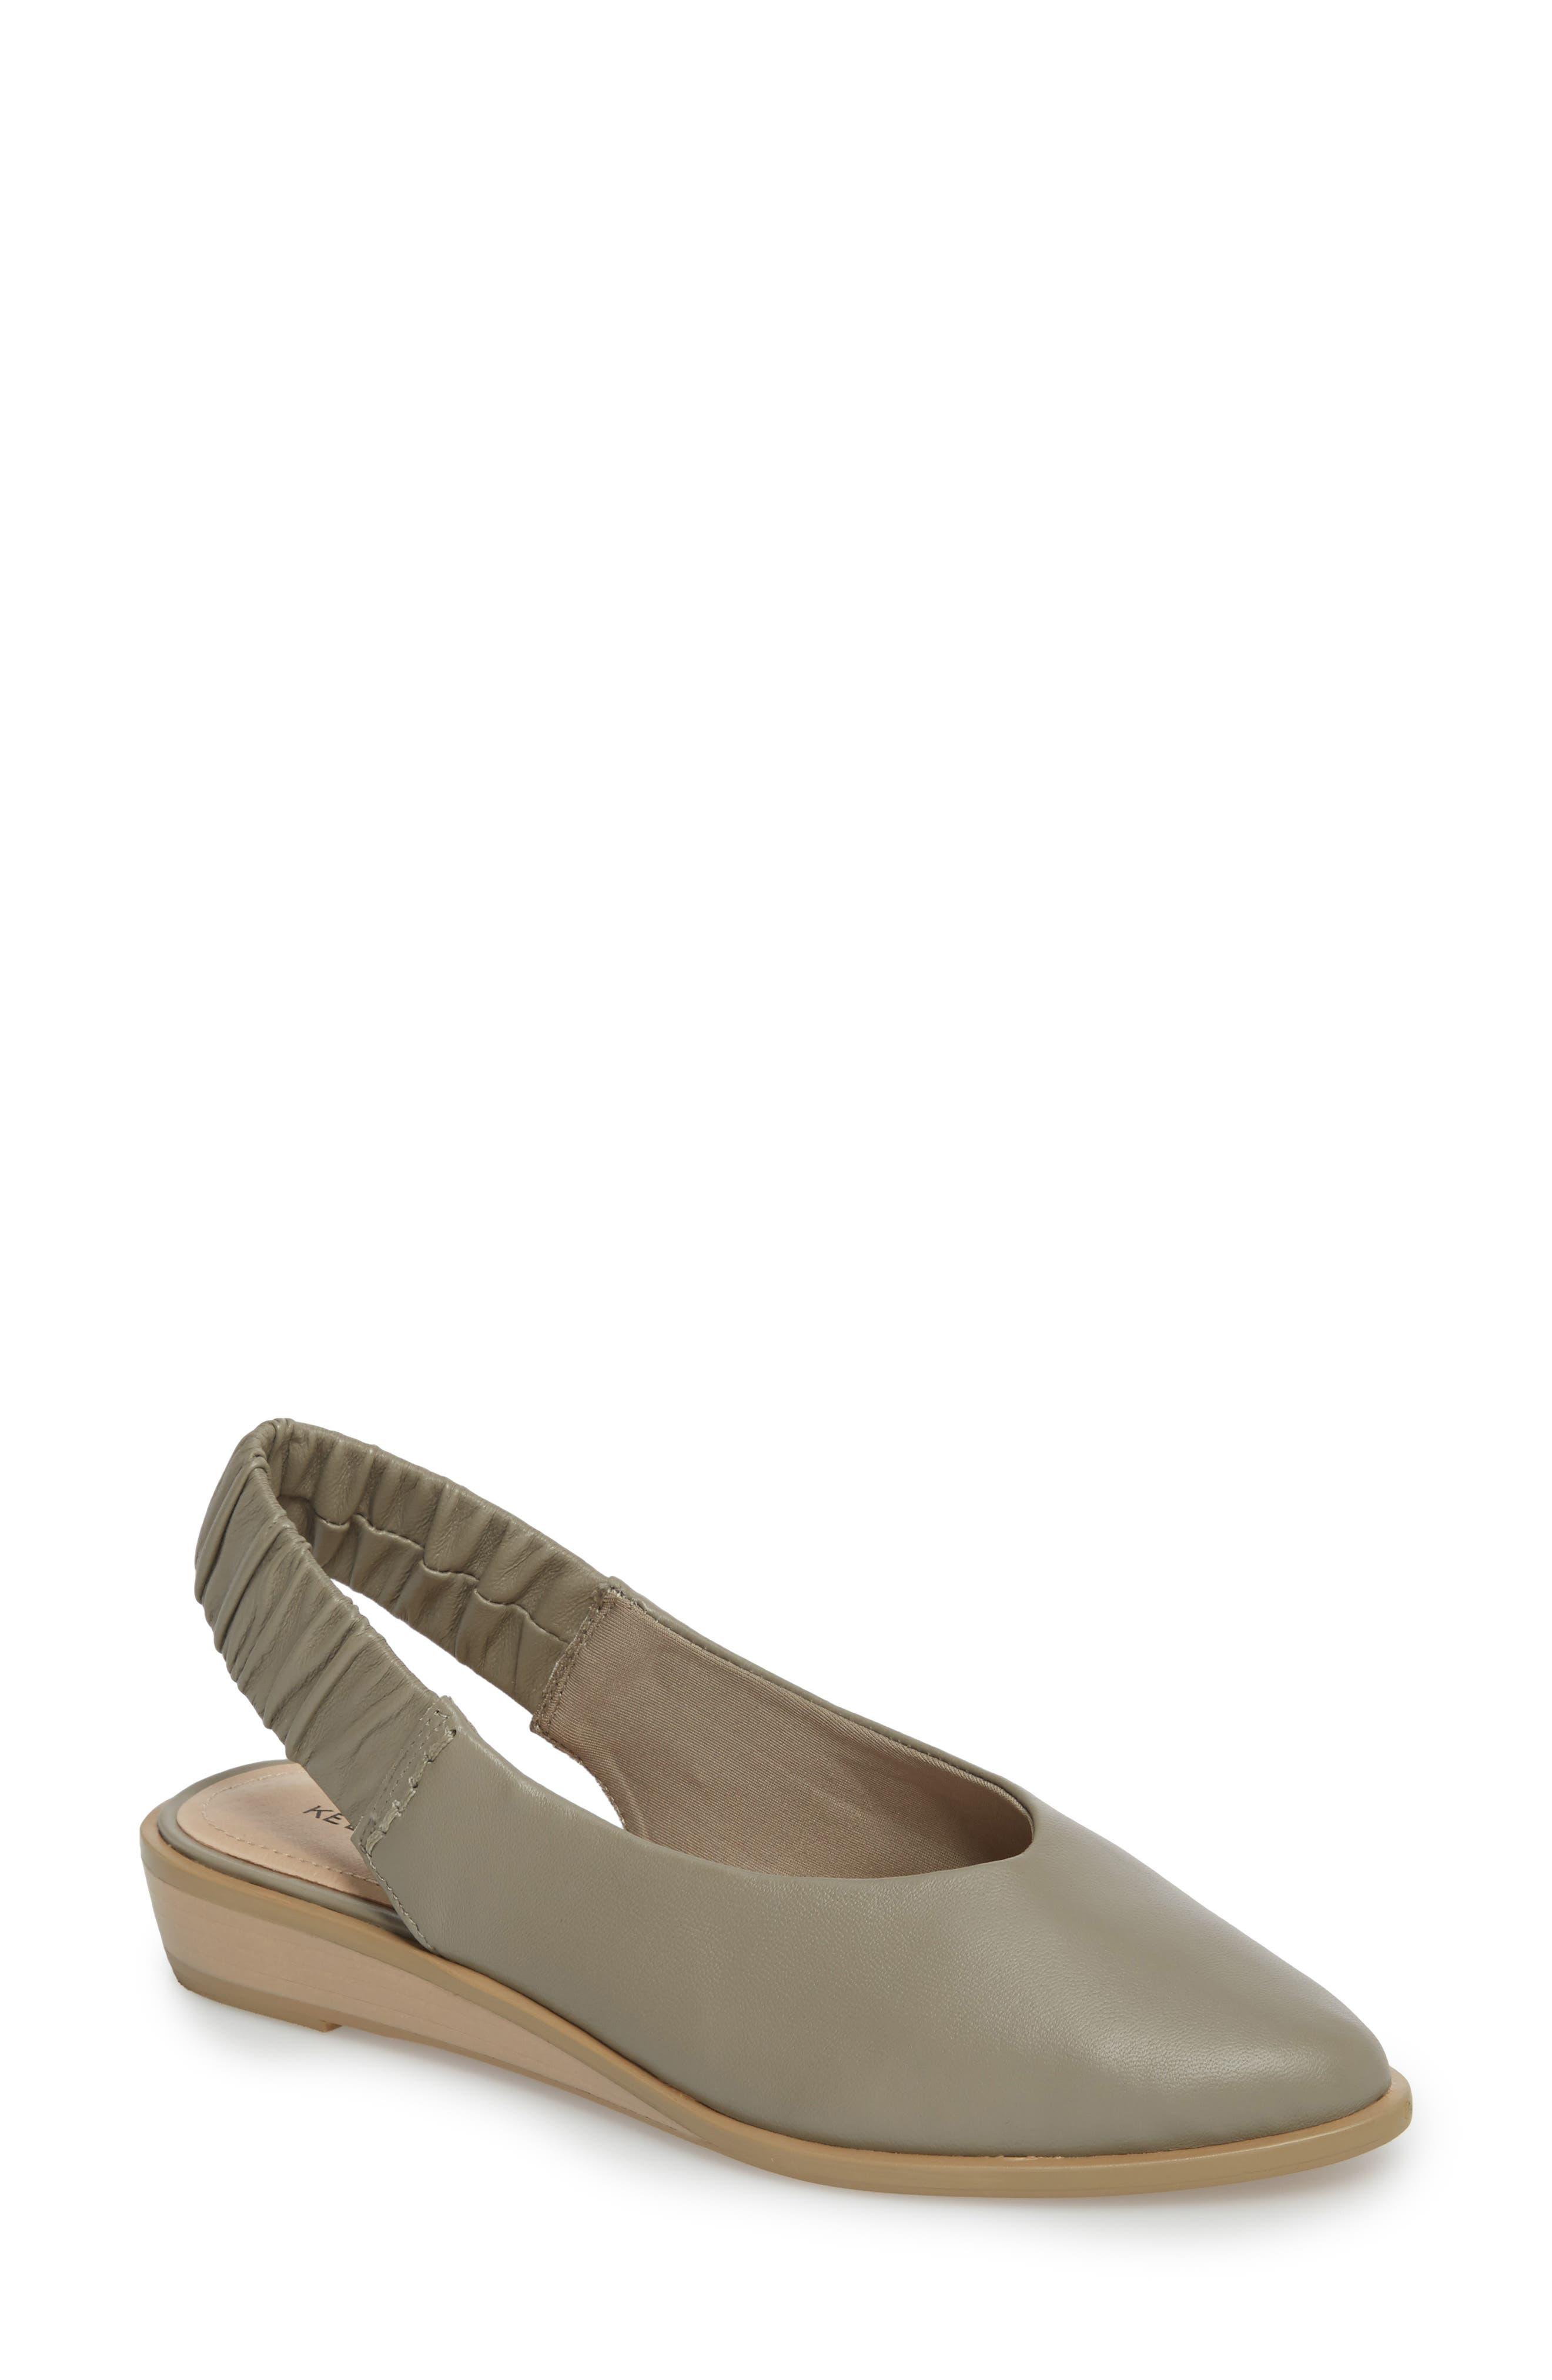 Alton Slingback Sandal,                             Main thumbnail 1, color,                             Clove Leather